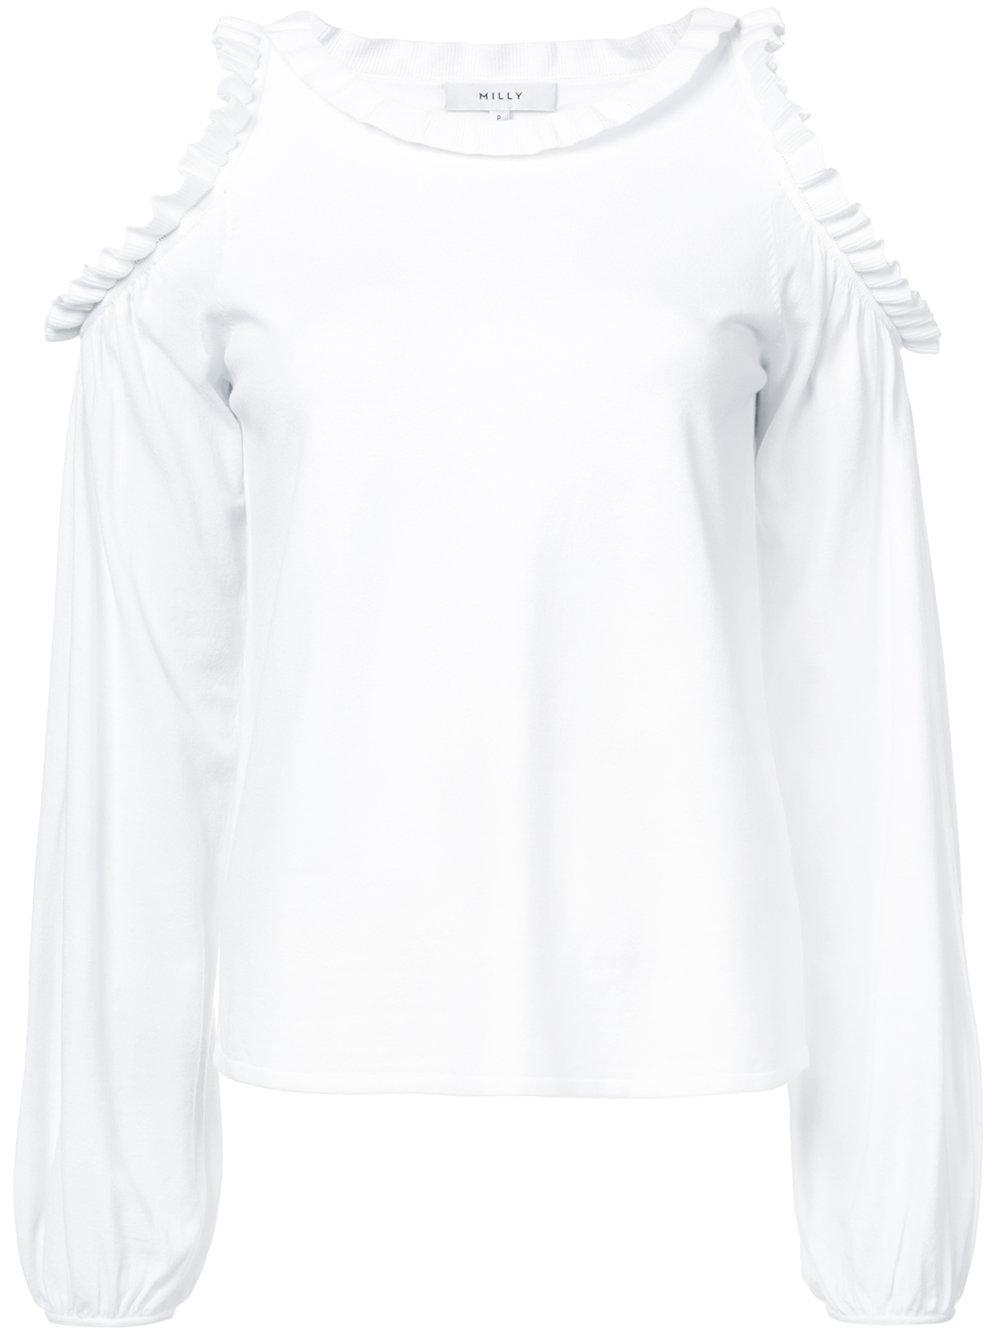 Cold Shoulder Ruffle Trim Long Sleeve Blouse Item # 206FK062335